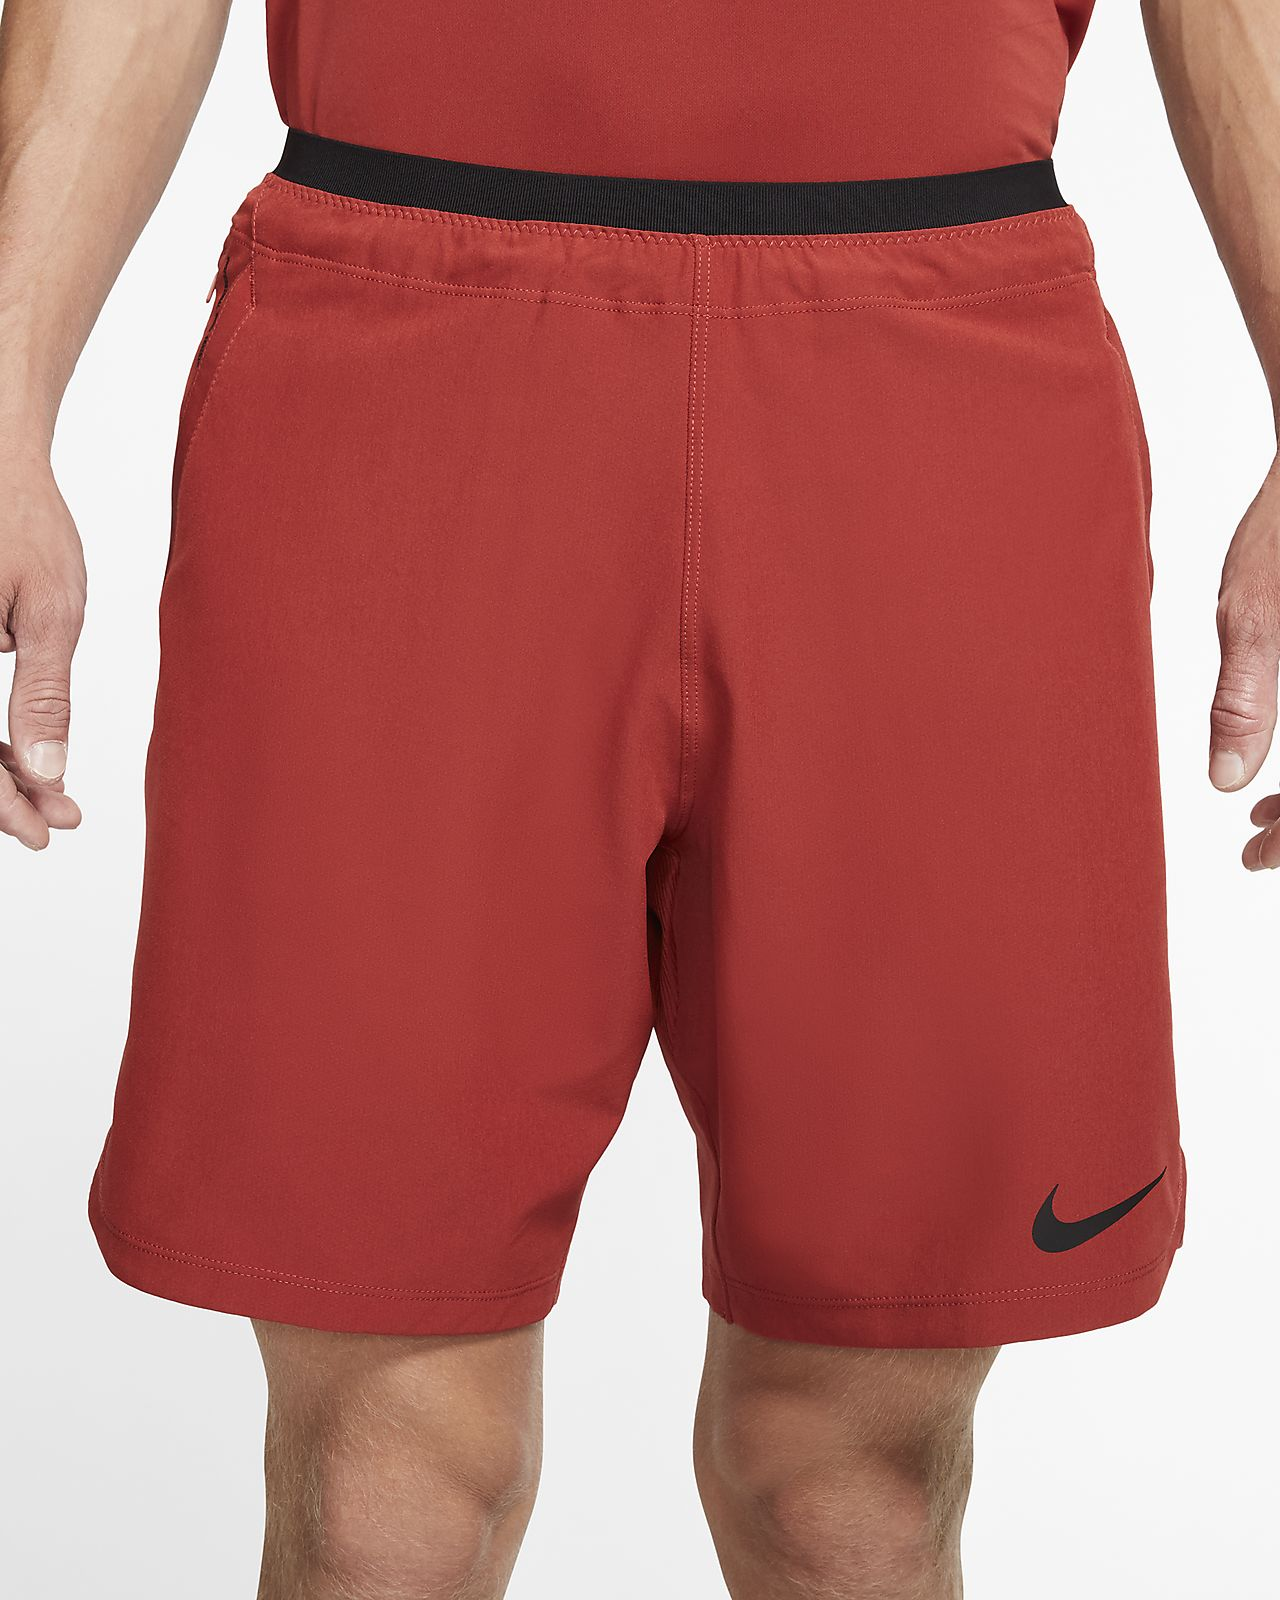 Nike Pro Flex Rep herreshorts